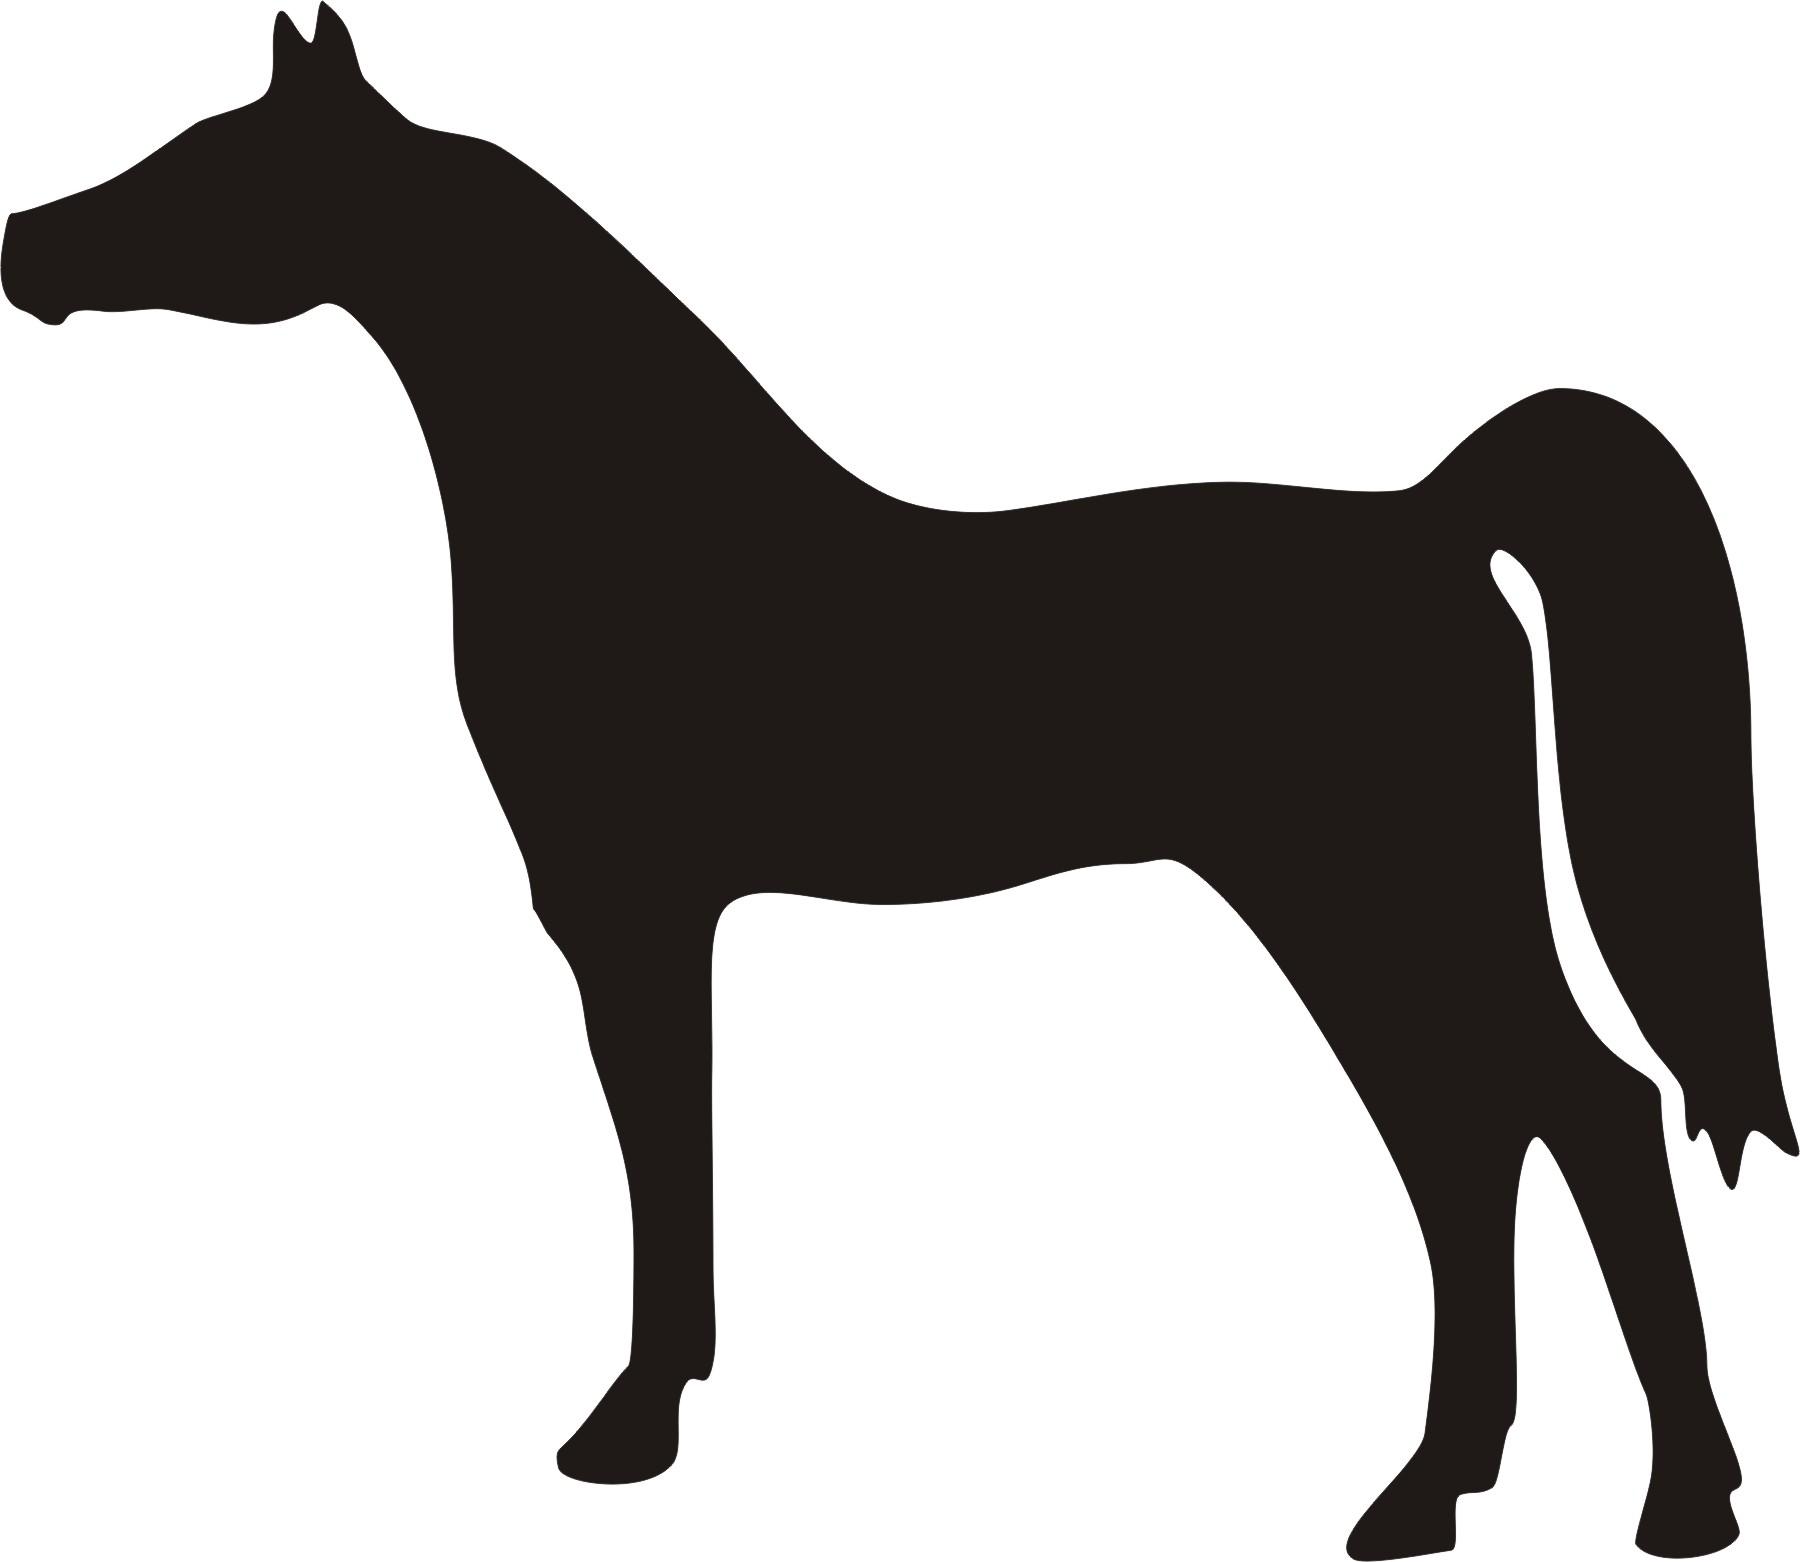 1800x1562 Horse Silhouette Clipart